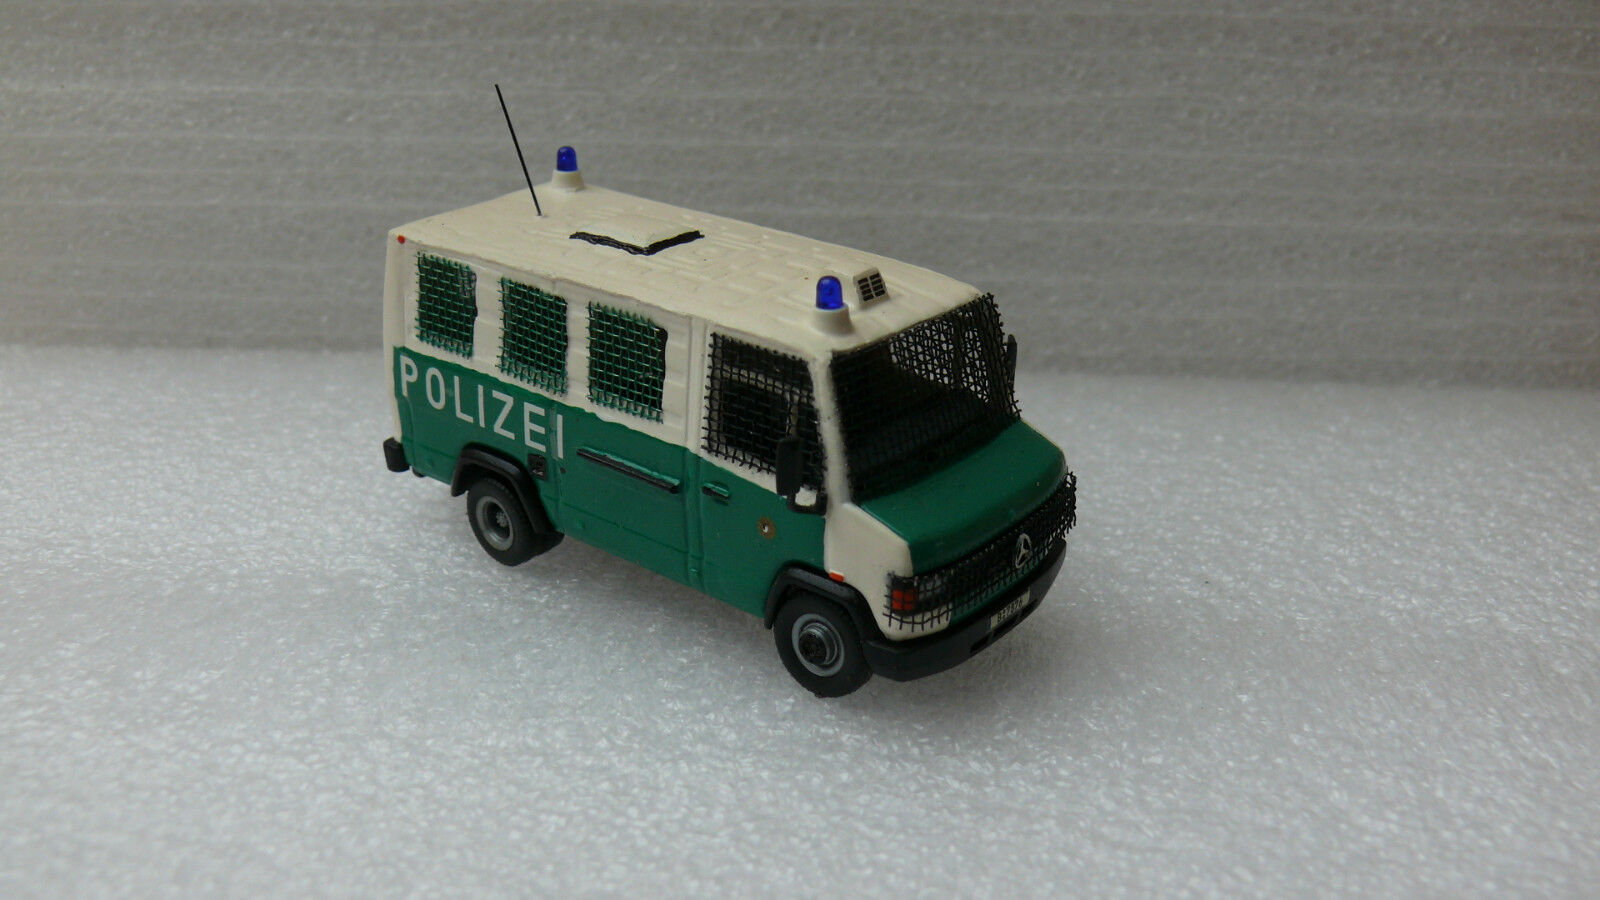 Polizia Berlino Bepo BPA grukw MB 611 D prossootipo h0 1 87 pezzo unico TOP RAR